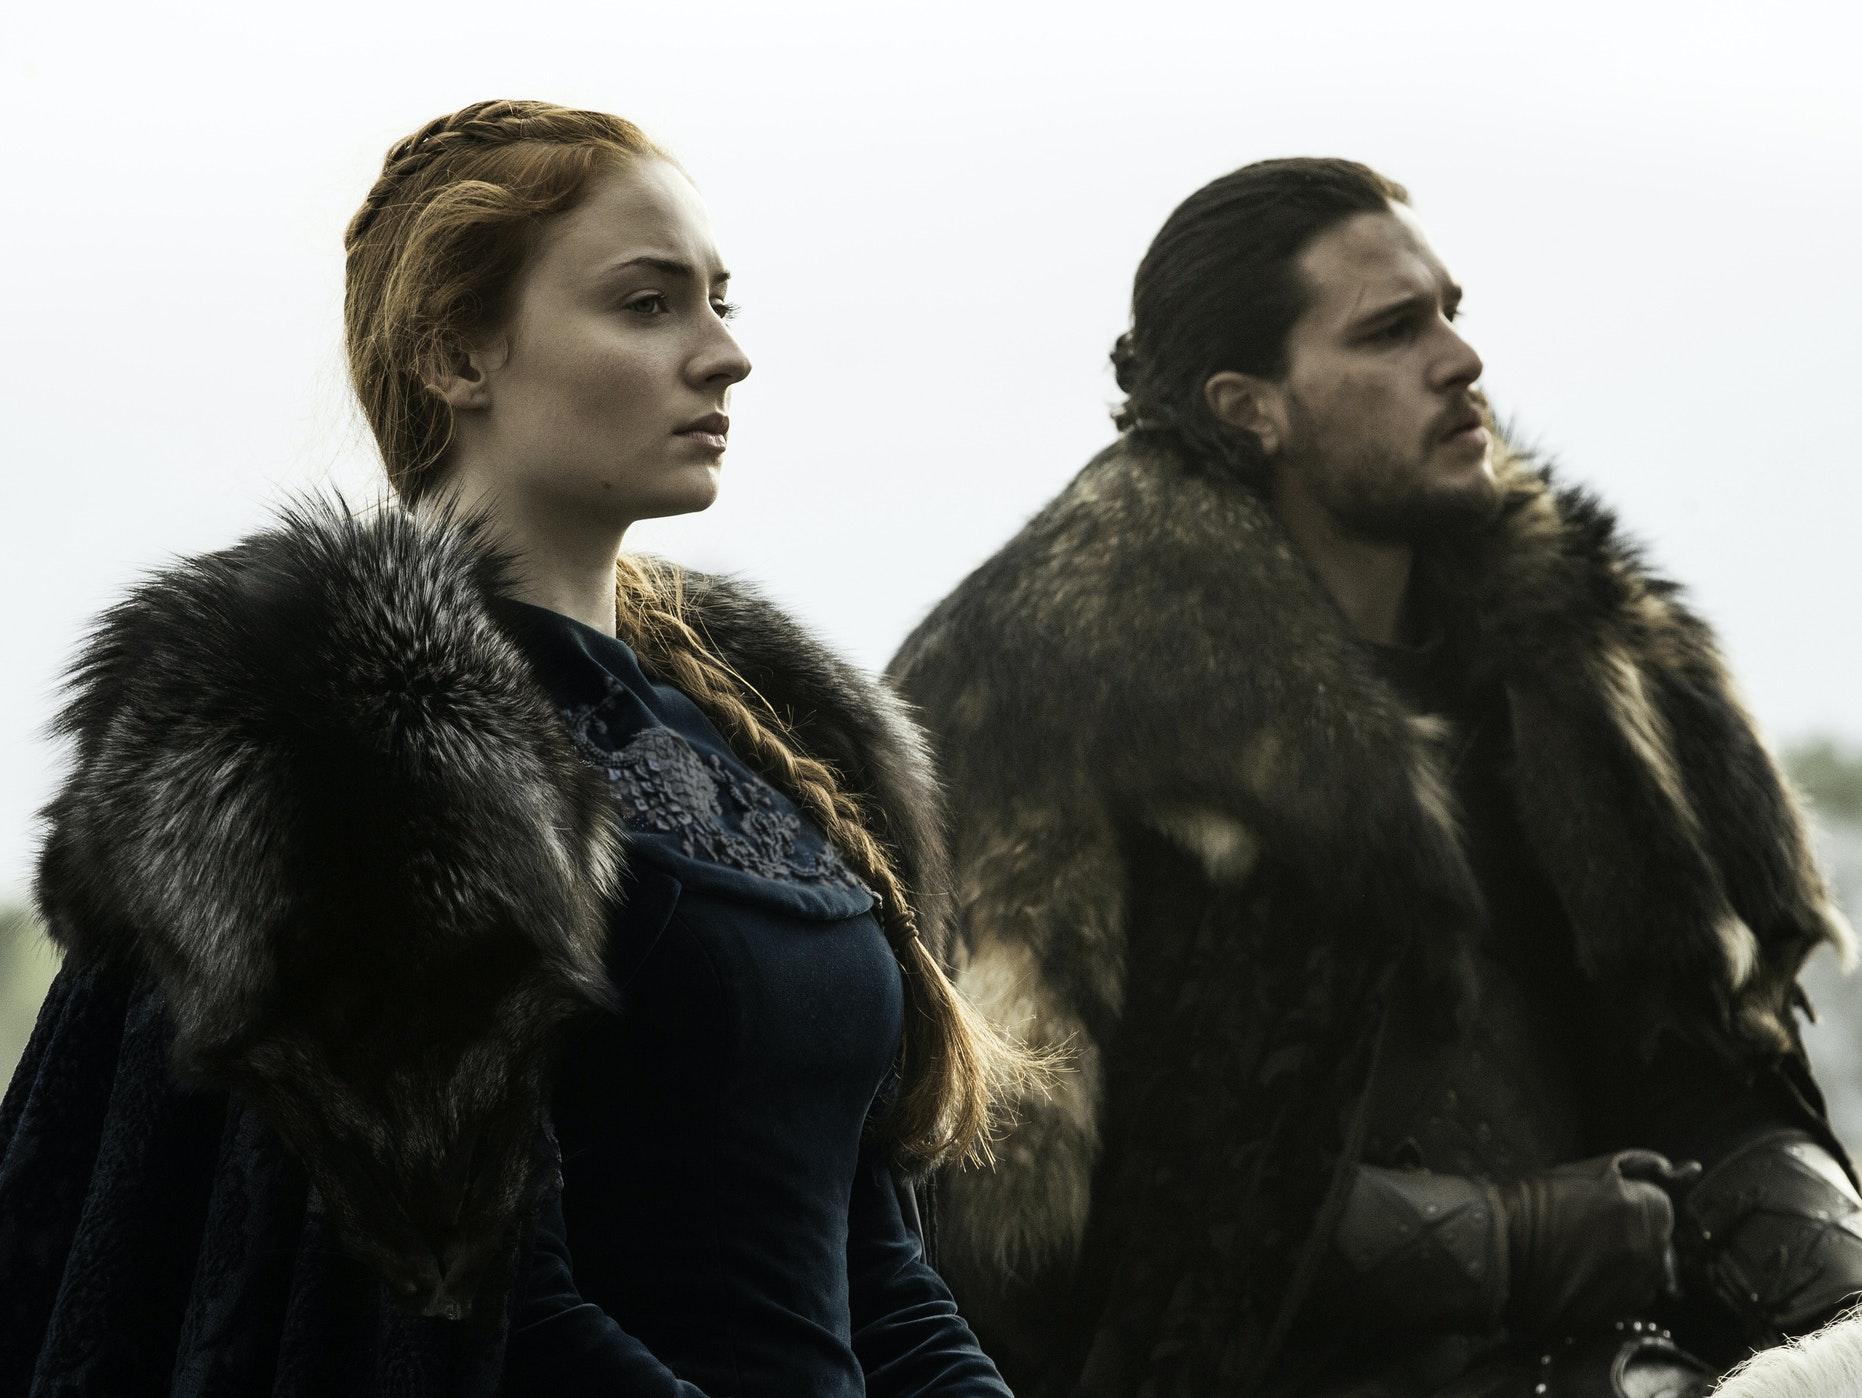 How Sansa Vs. Jon Could Divide the North in 'GoT' Season 7